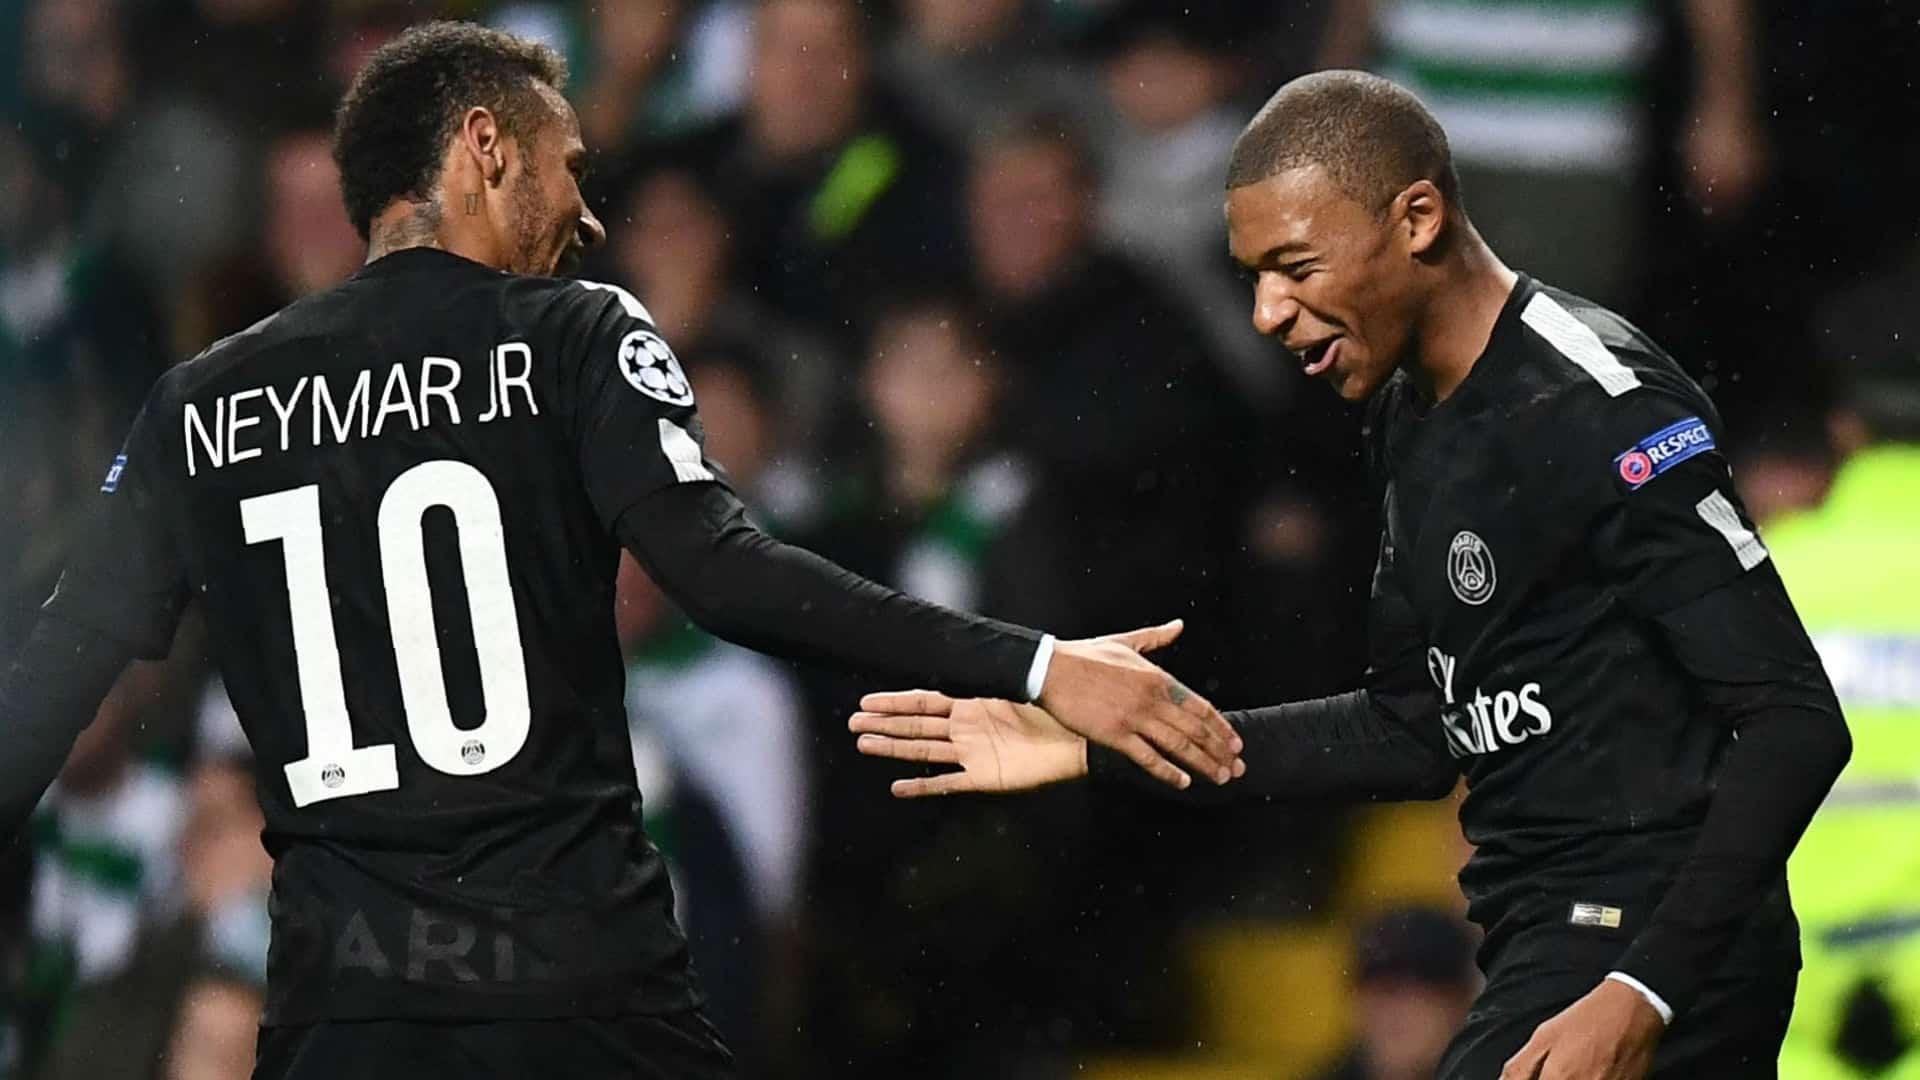 Calciomercato Juventus, Cristiano Ronaldo a giugno al PSG, i bianconeri puntano su uno tra Kylian Mbappé e Neymar